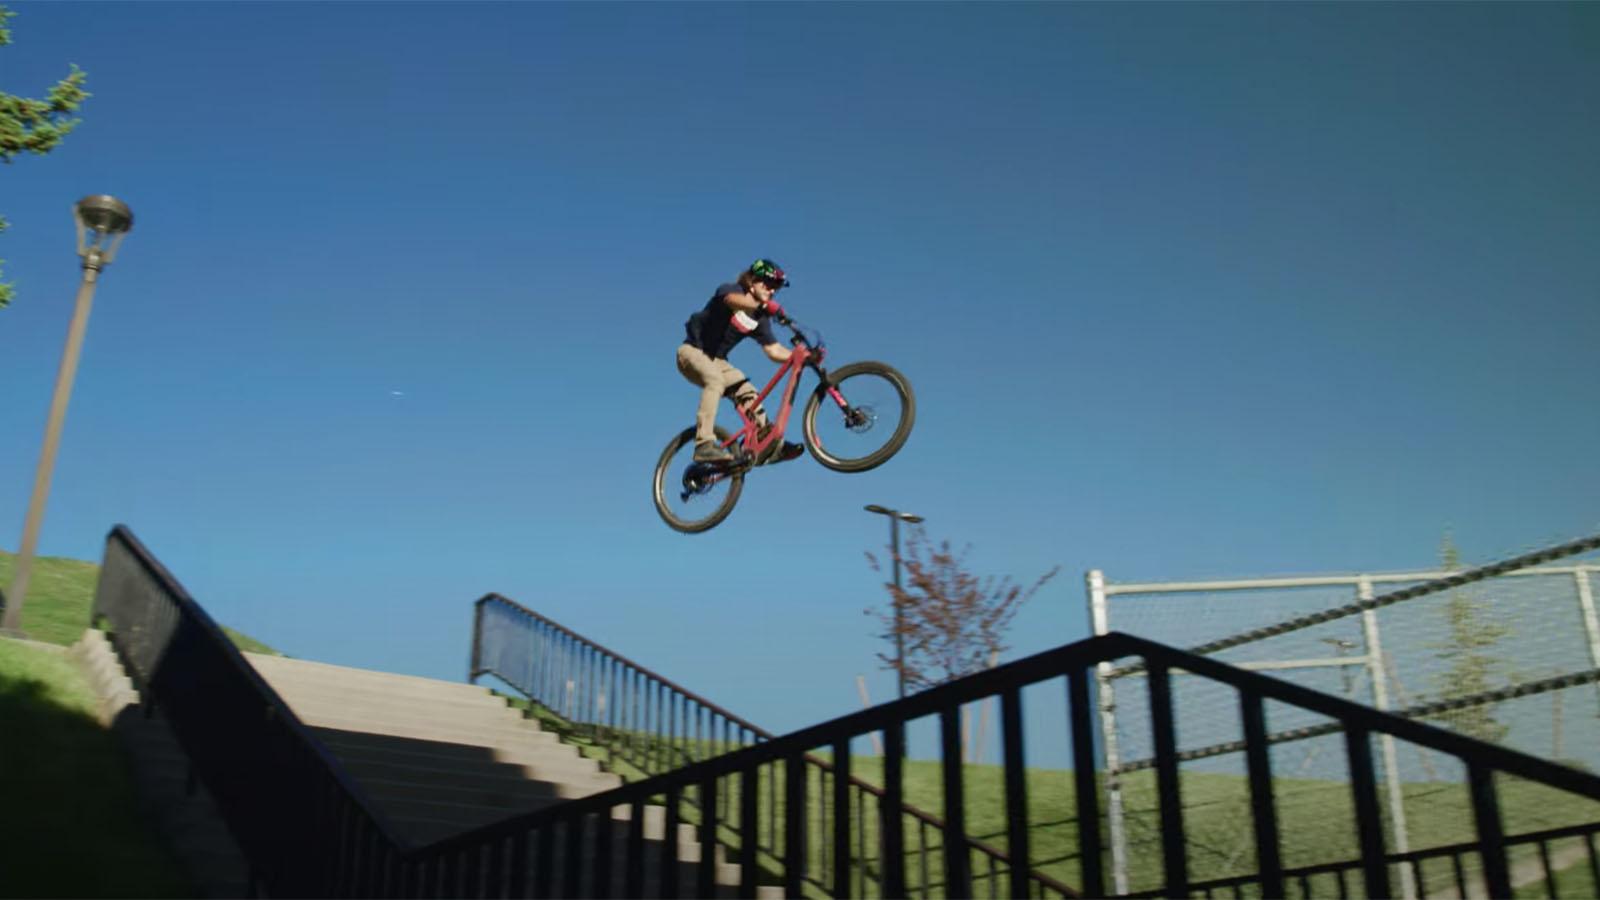 Mitch Ropelato's Skills Know No Limit